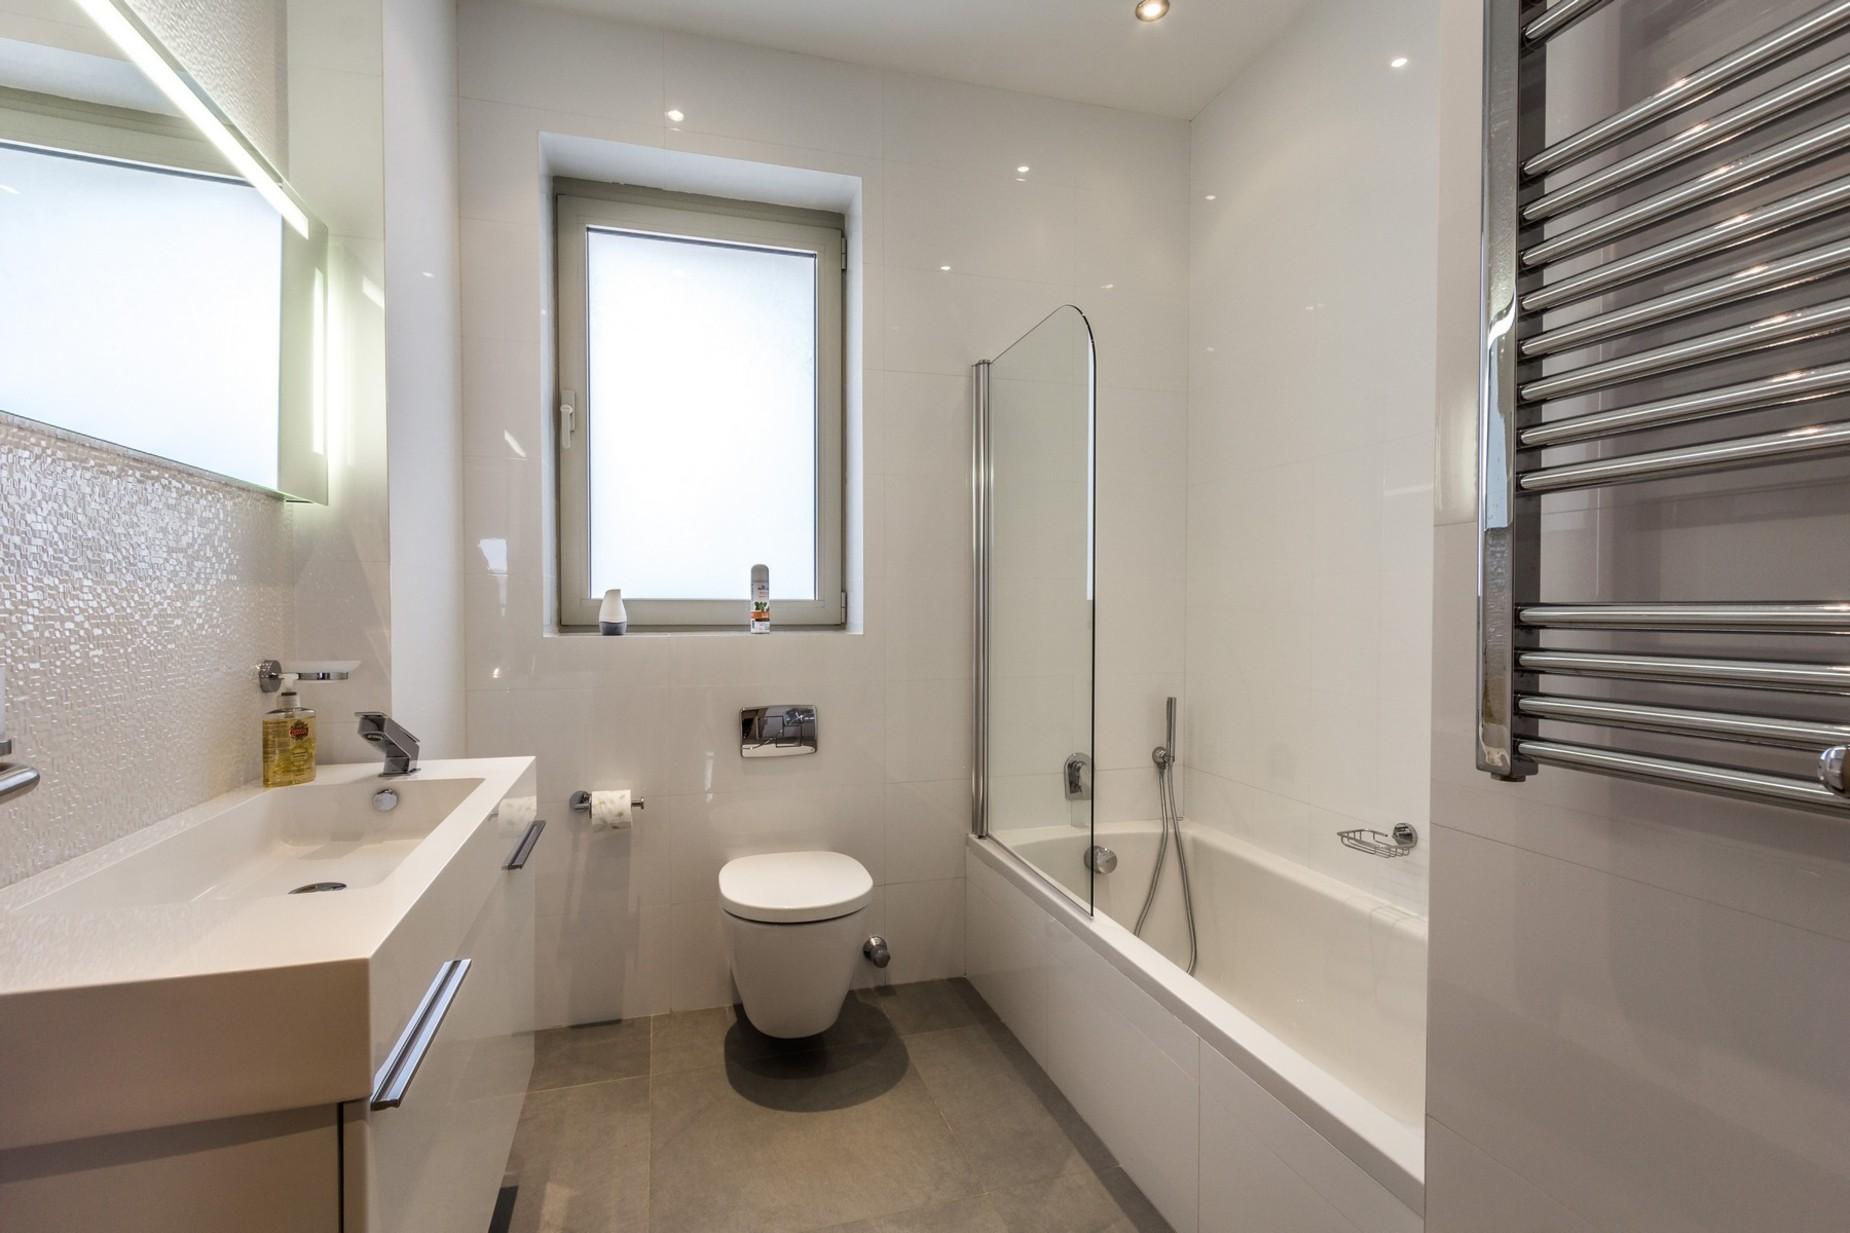 3 bed Apartment For Rent in Sliema, Sliema - thumb 13